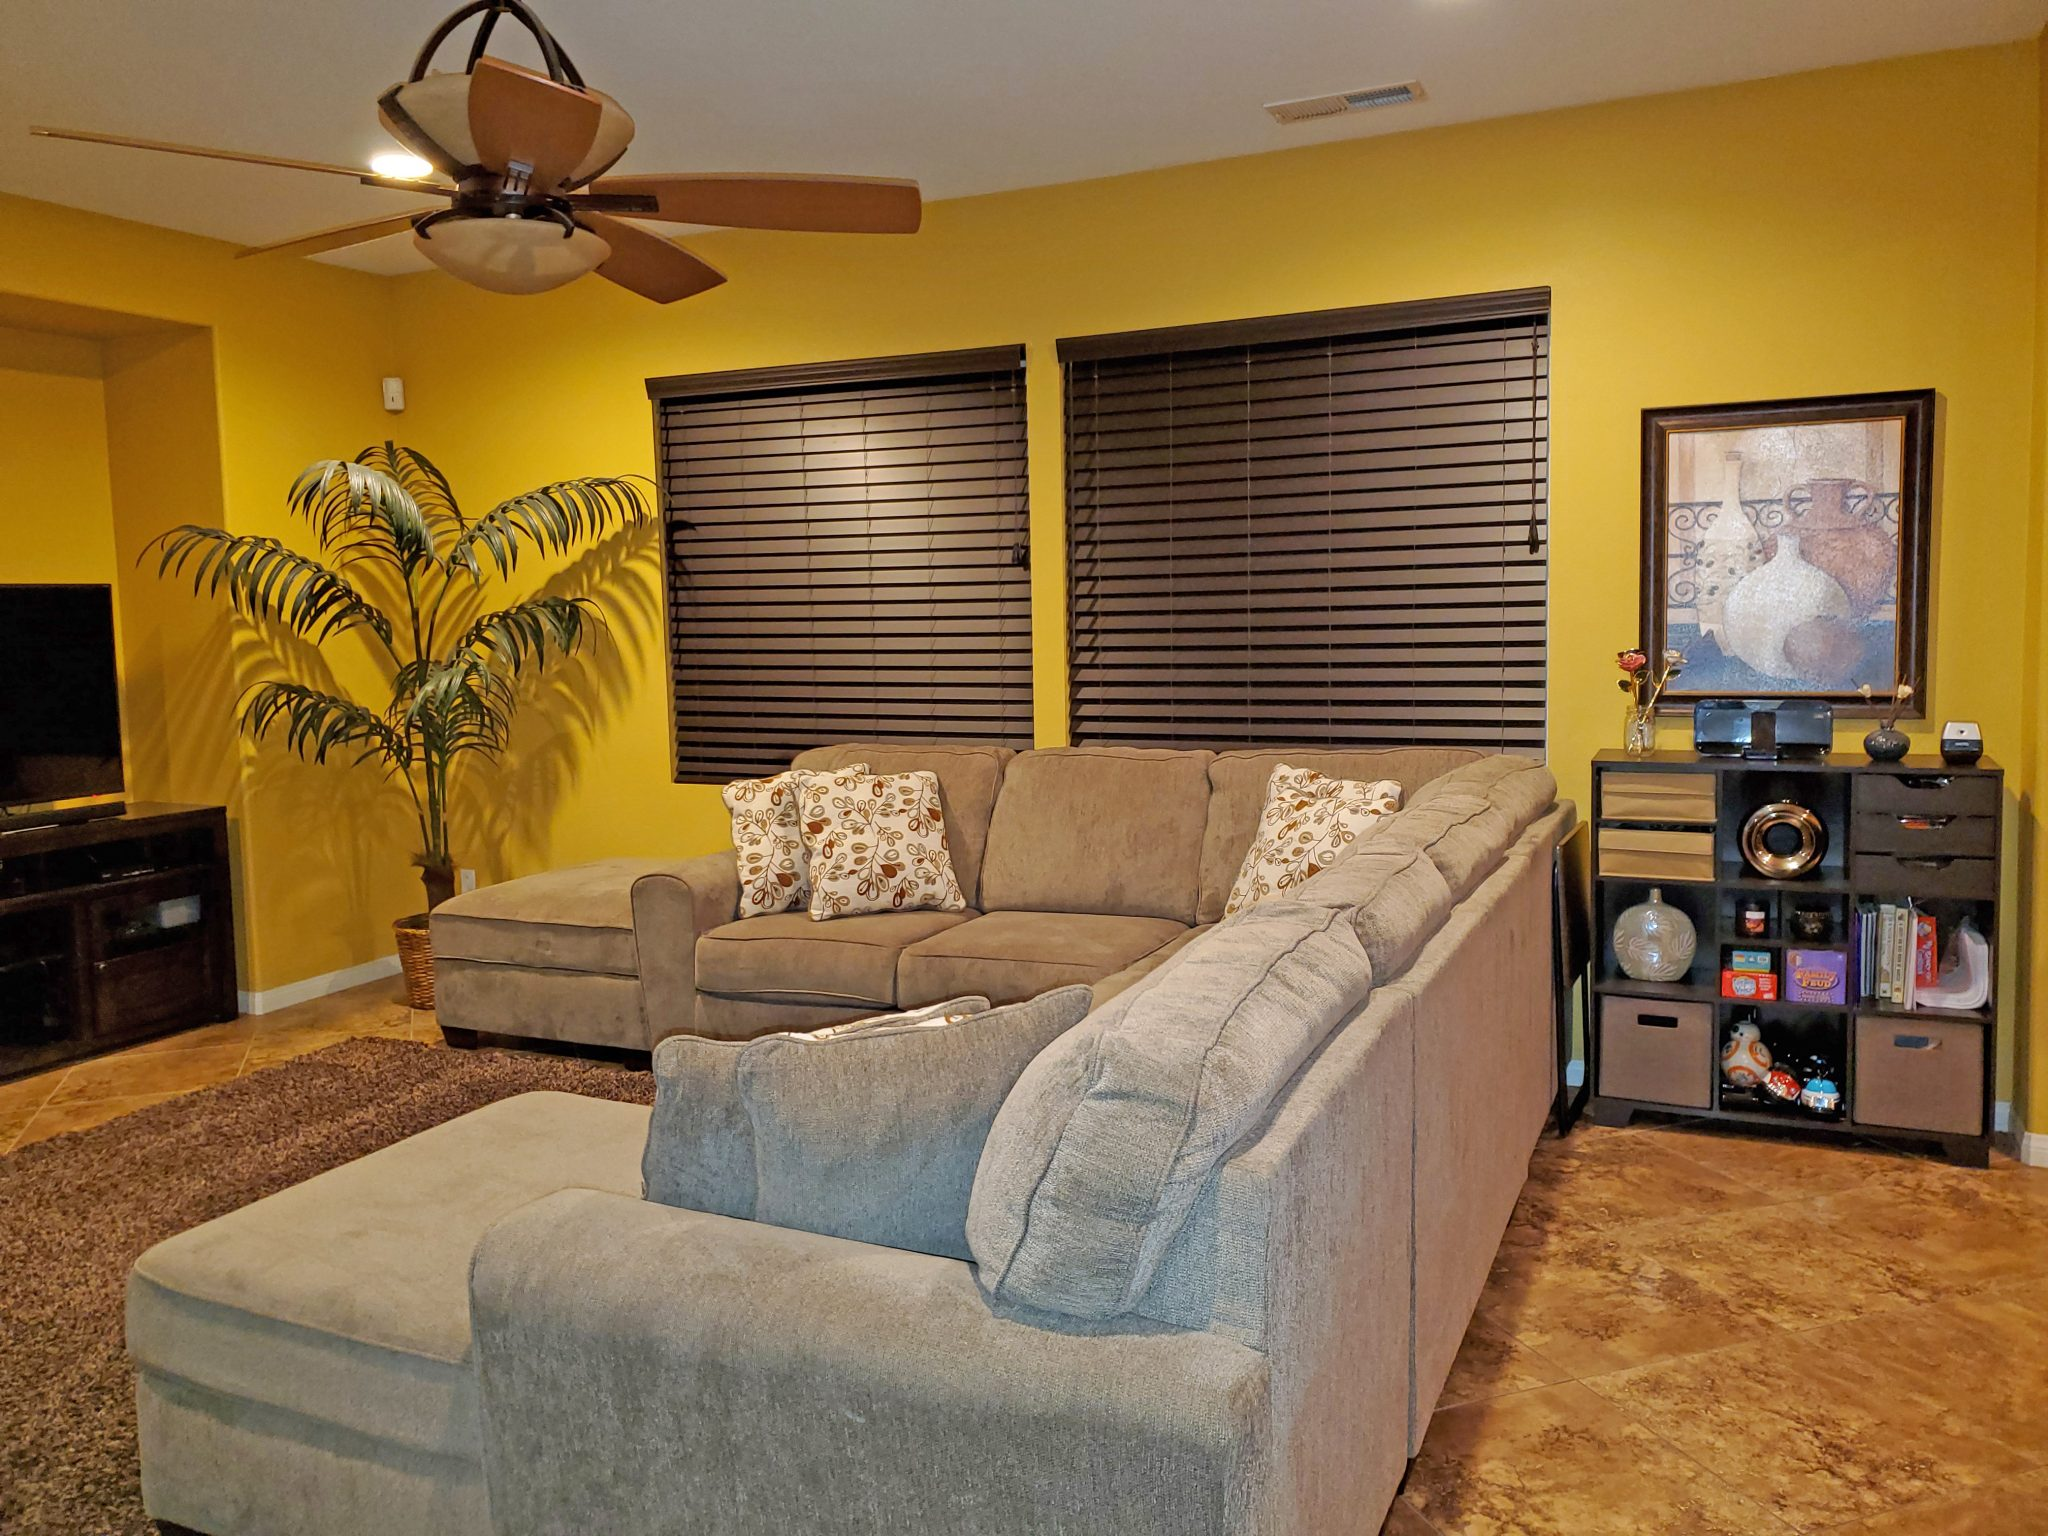 124 Boston Ave., Beaumont Ca. 92223 Family Room